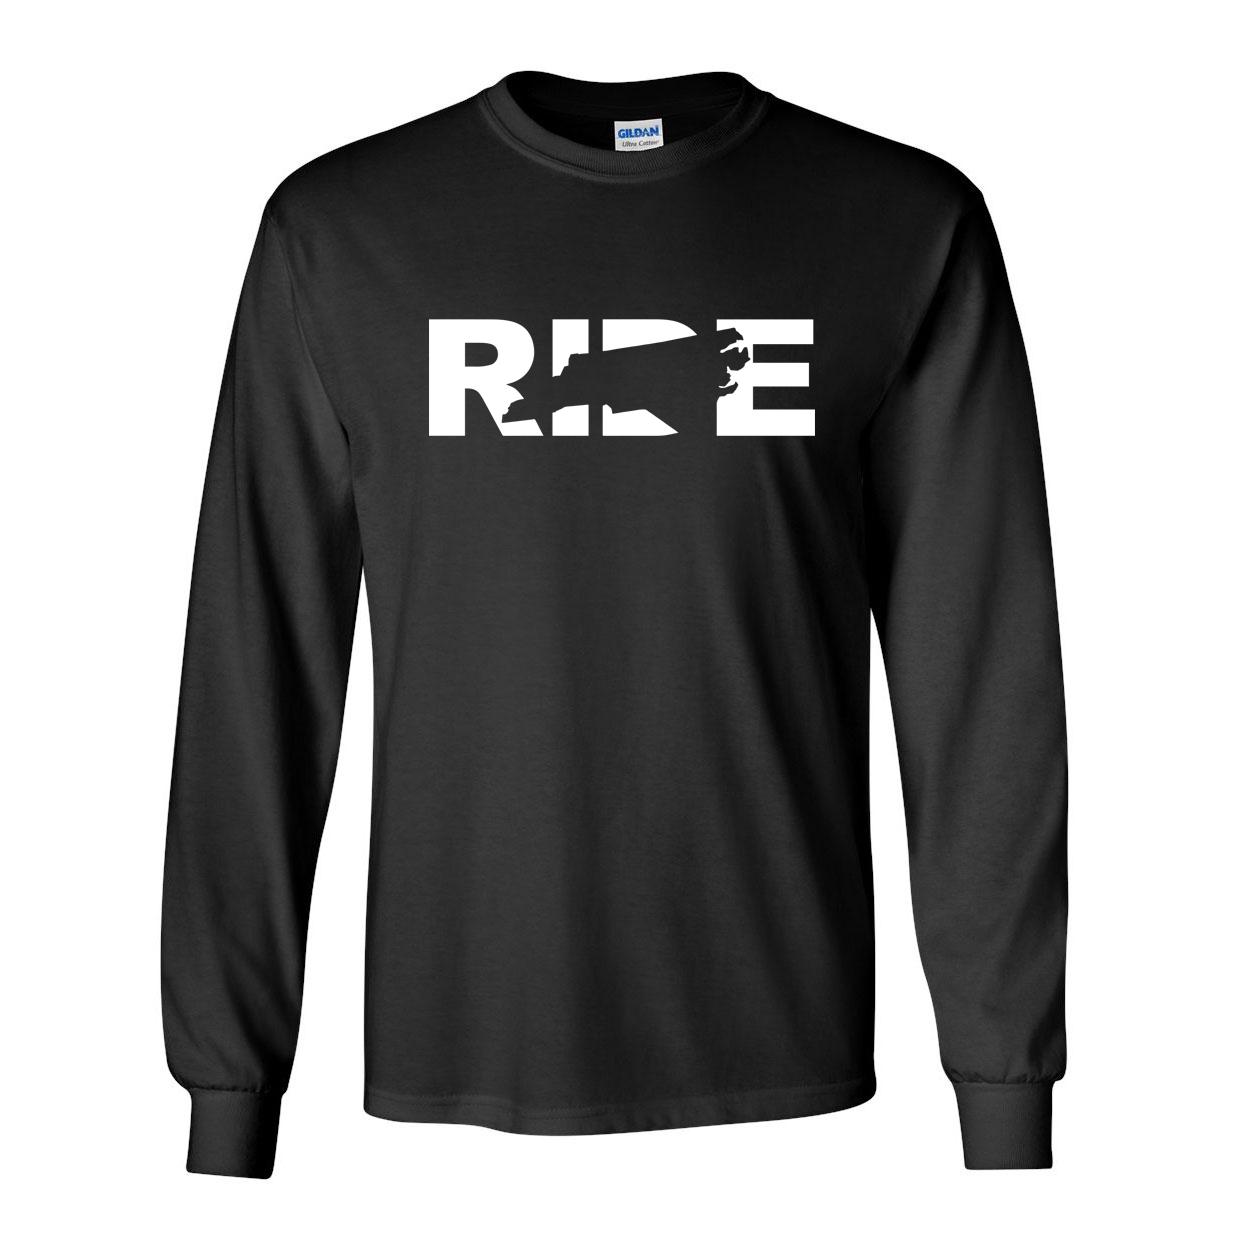 Ride North Carolina Classic Long Sleeve T-Shirt Black (White Logo)